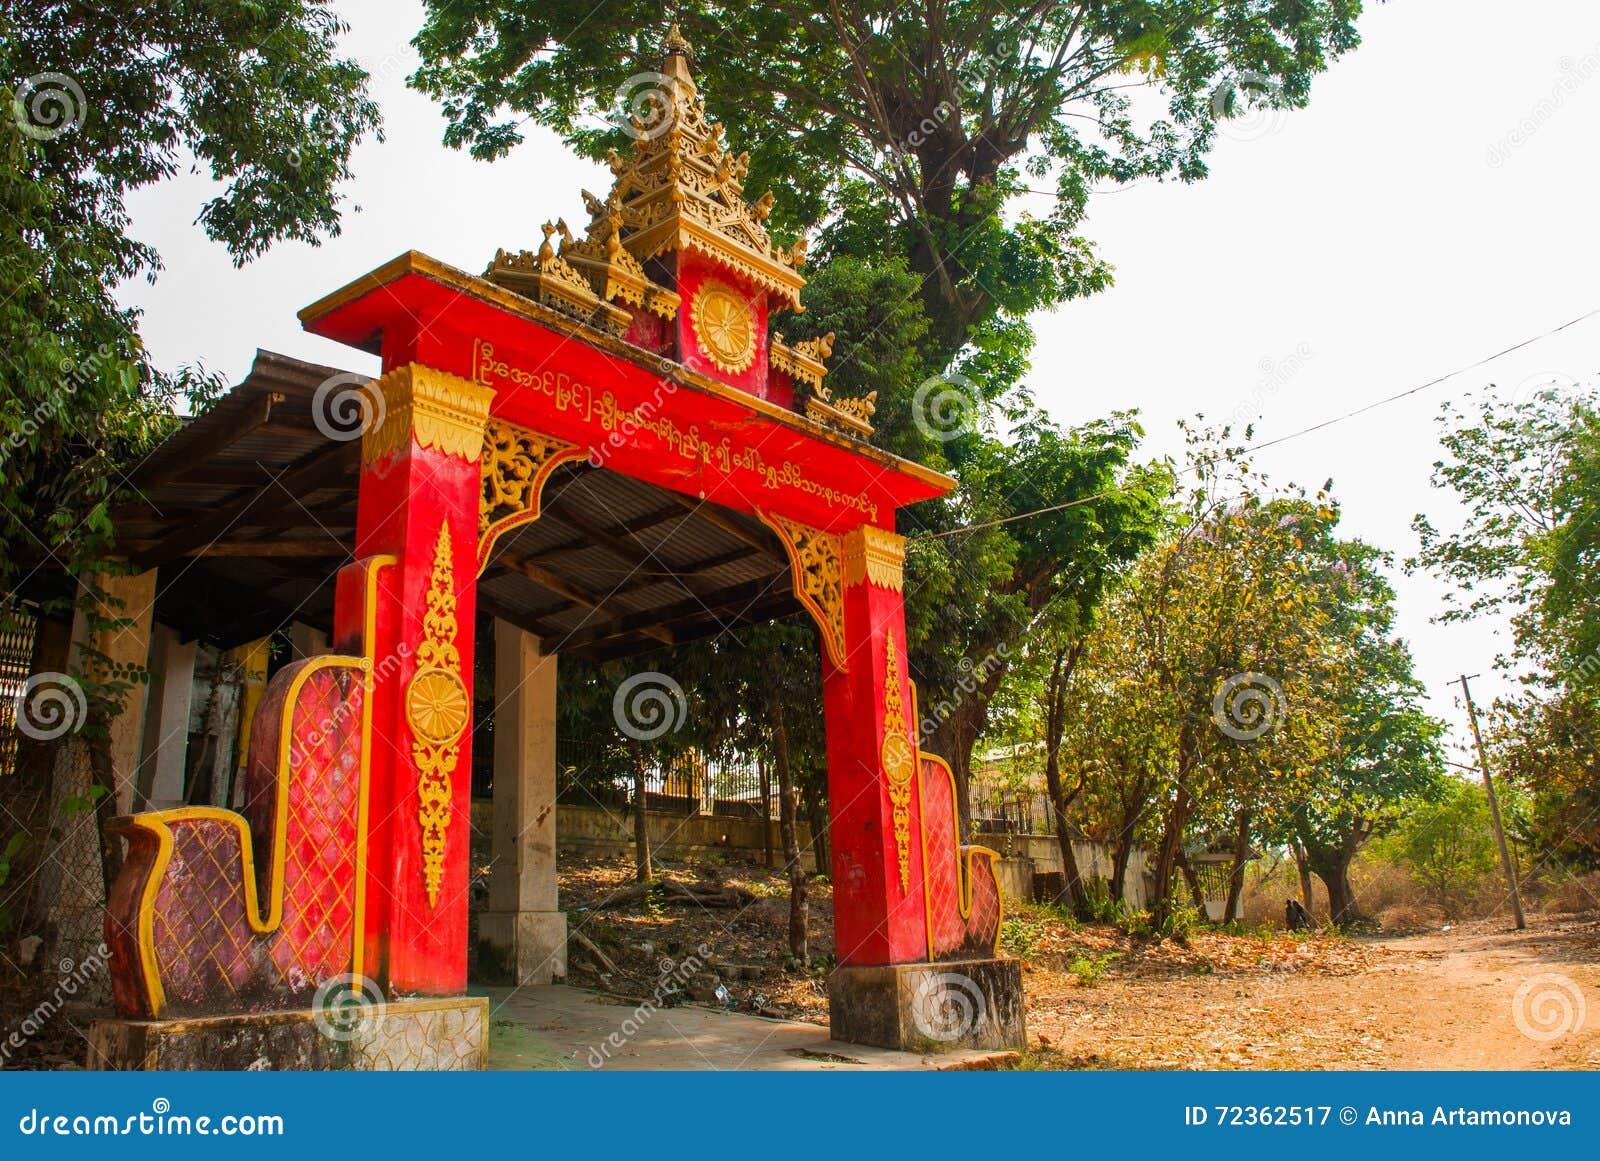 L entrée au temple Pagoda Kyaikpun Bouddha Bago, Myanmar burma